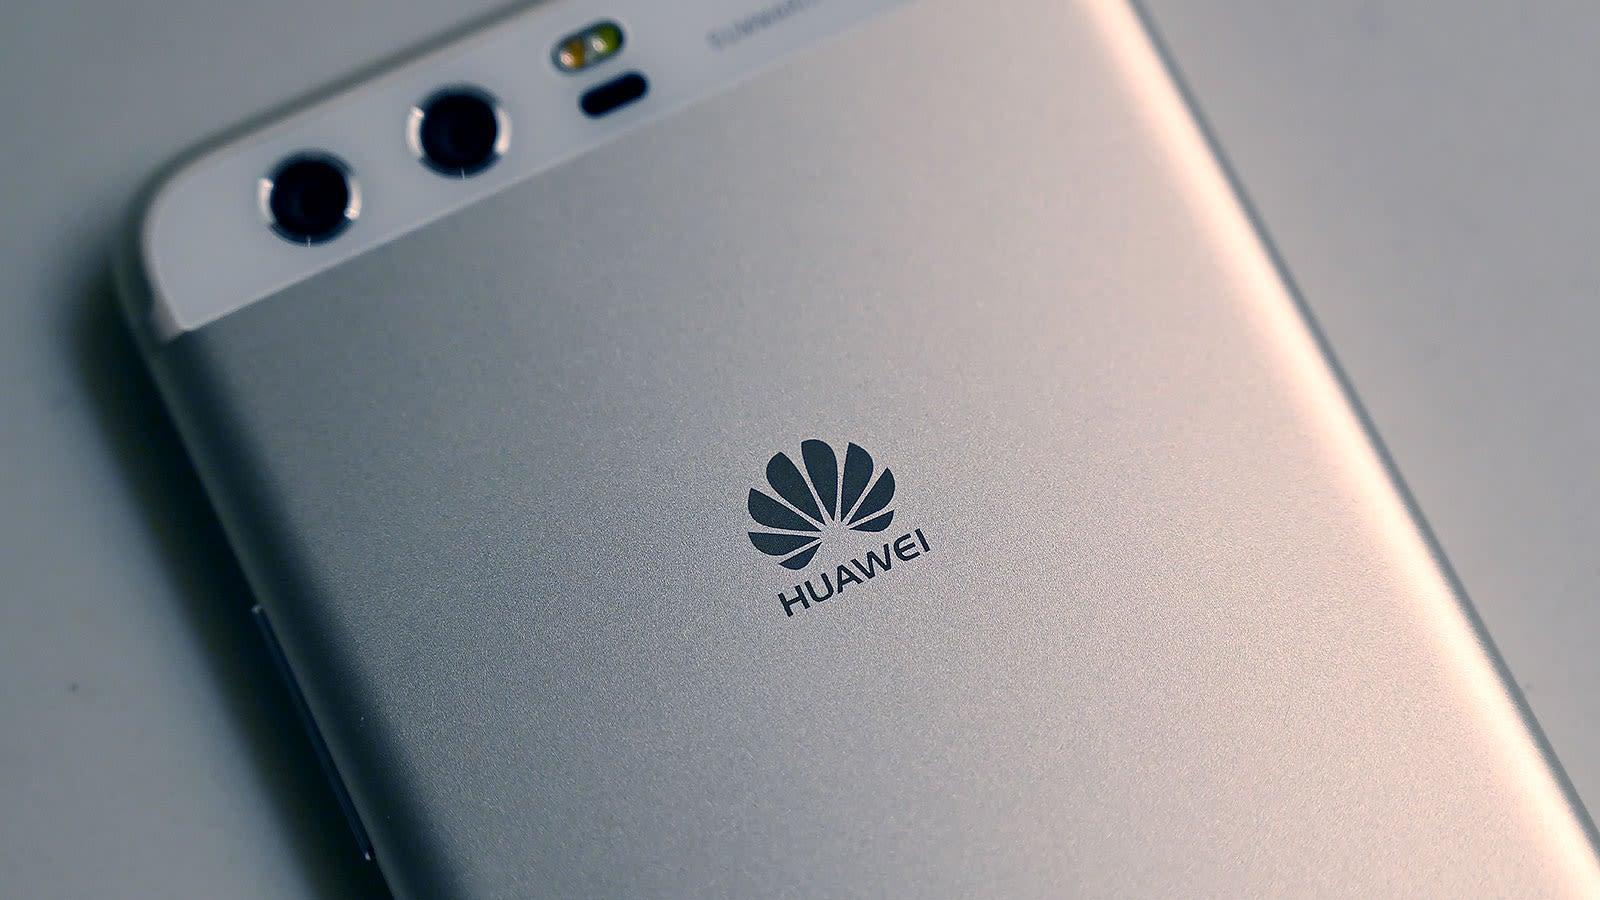 It Appears U.S. Has A 'Smoking Gun' Confirming Huawei-Built Spy Backdoors